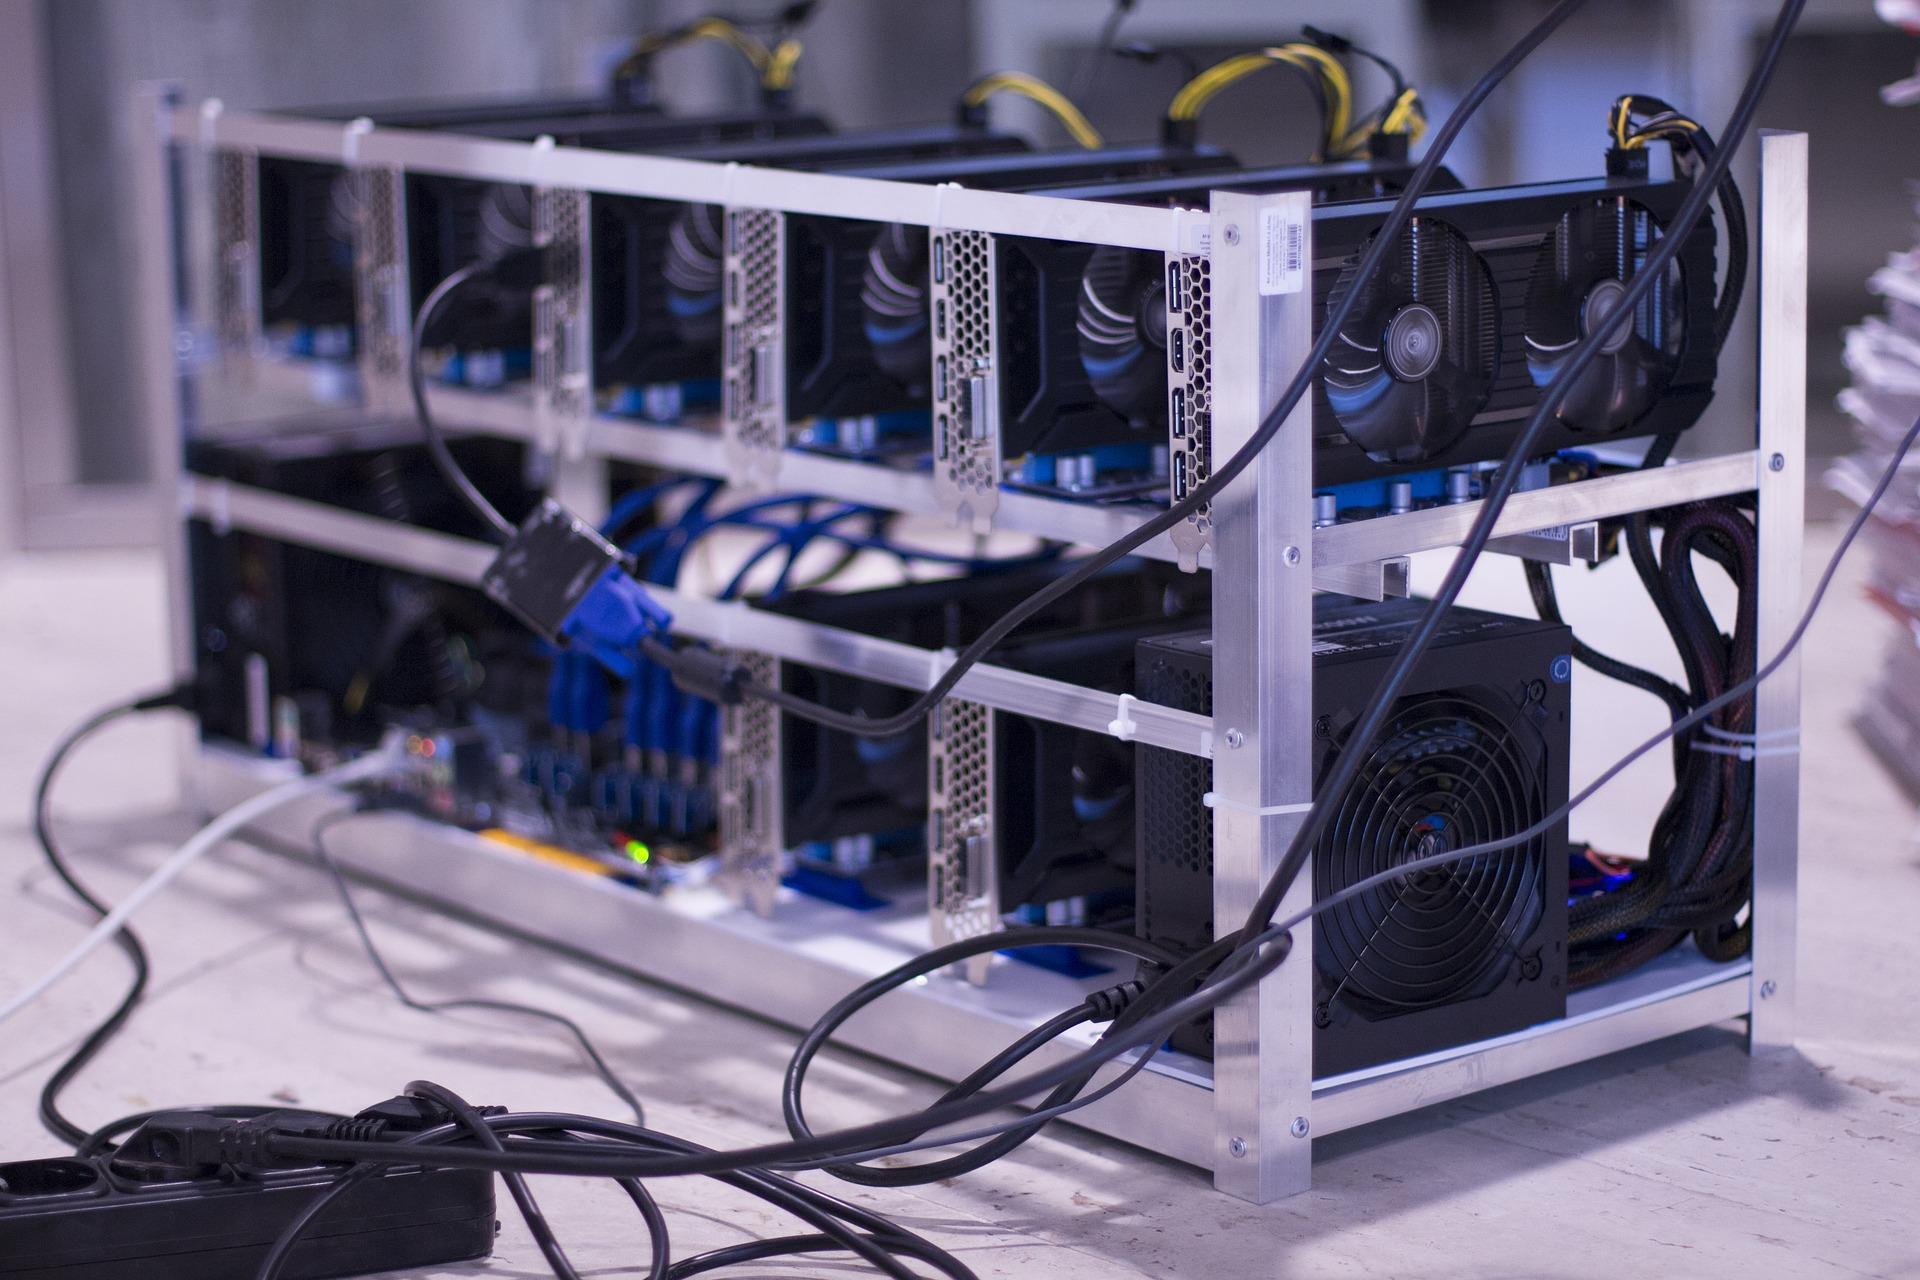 Cumulative Bitcoin Mining Revenue Surpasses $20 Billion